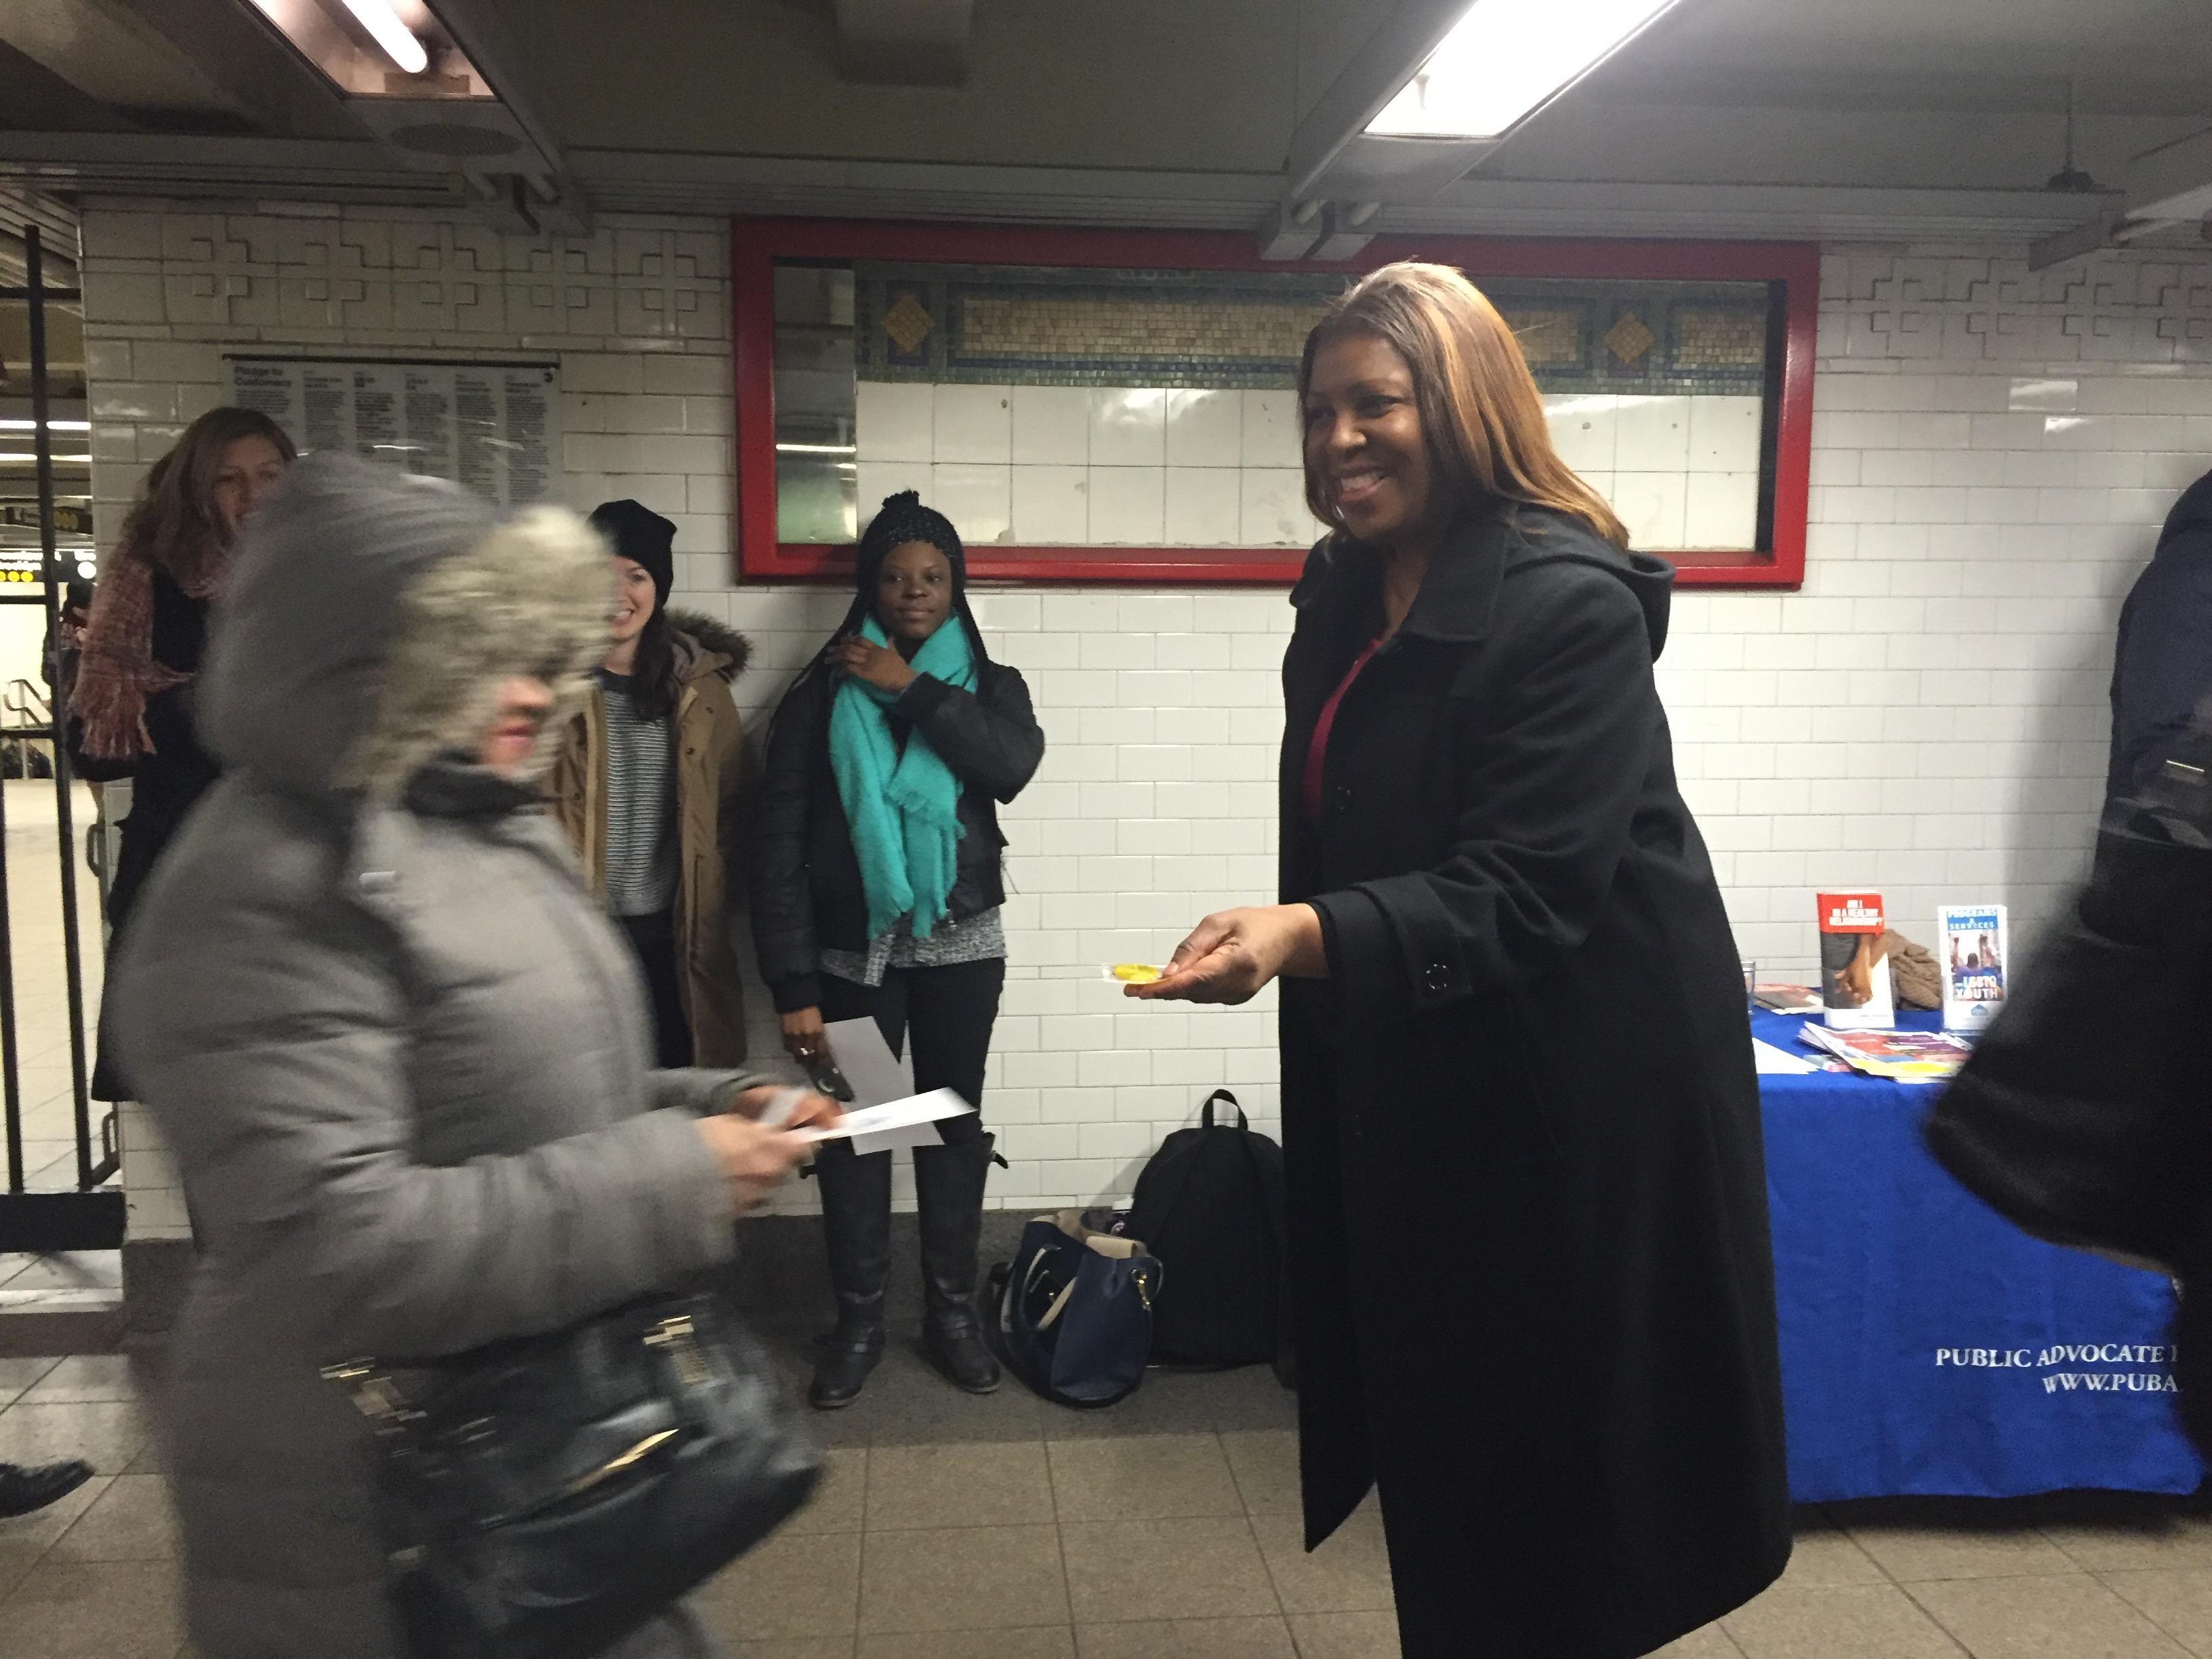 Public Advocate Letitia James hands out free condoms in the Union Square subway station. (Photo: Jillian Jorgensen for Observer)